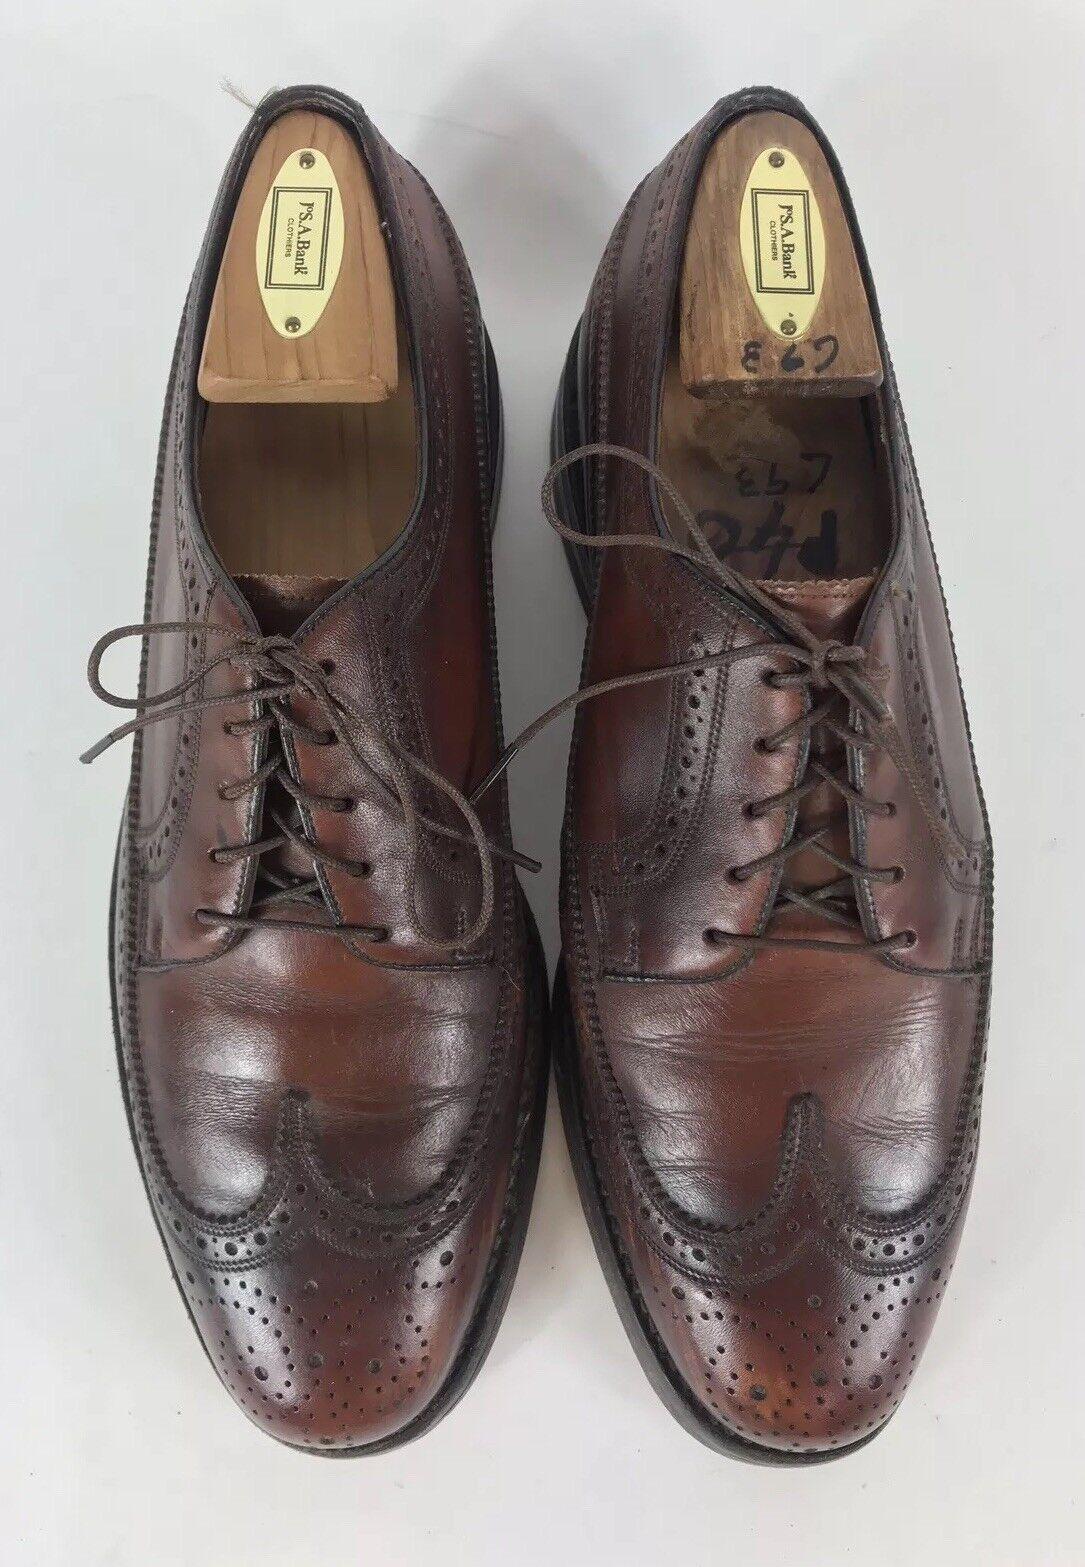 Florsheim Vintage Brown 5 Eye Wingtip Oxfords All Leather Size 8.5